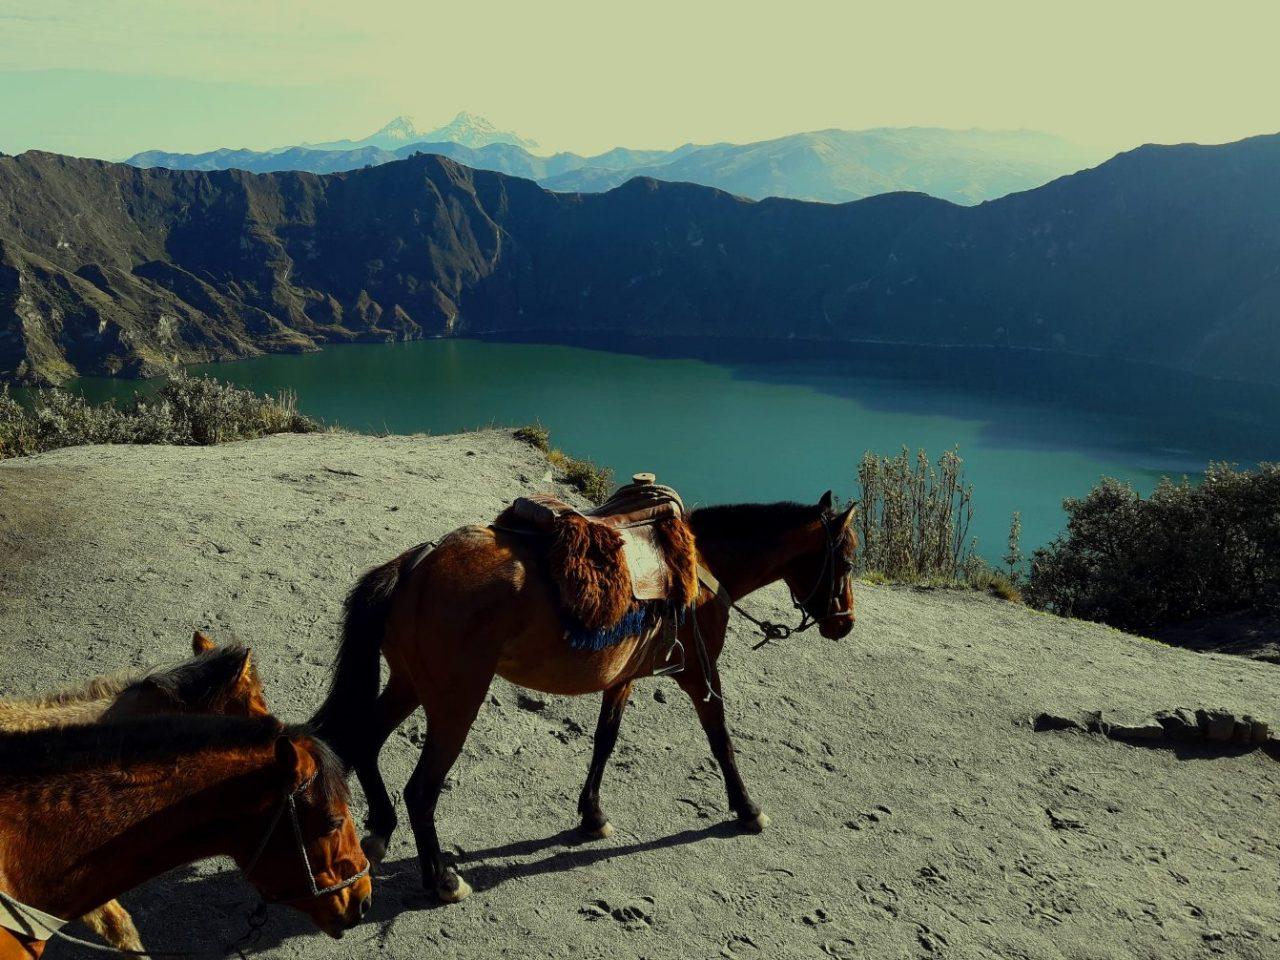 quilotoa crater lake tour, quilotoa volcano tour, ecuatouring